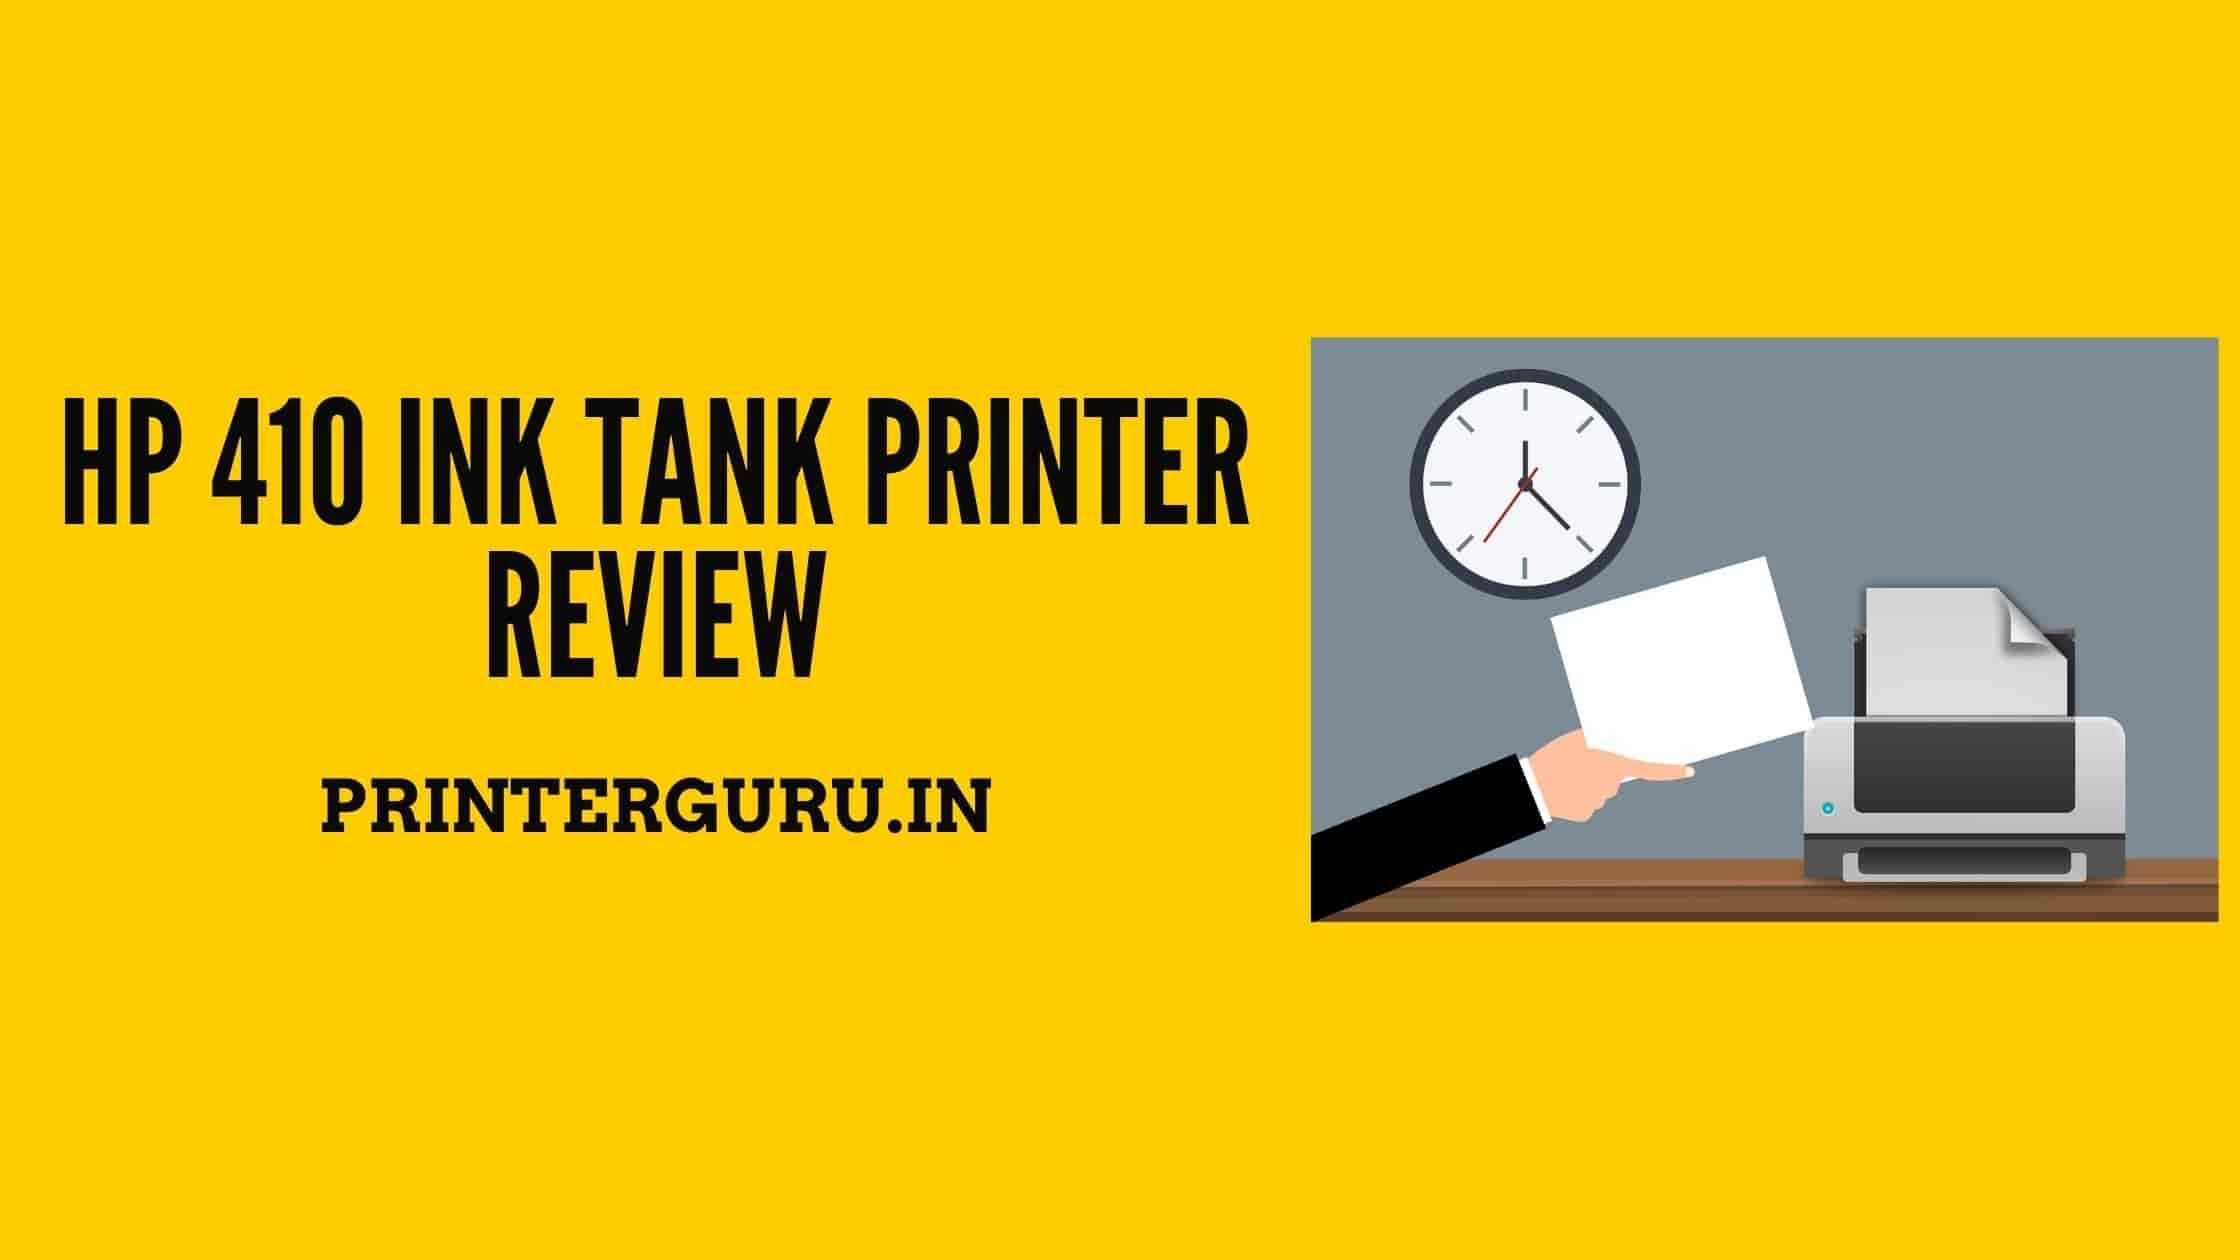 HP 410 Ink Tank Printer Review